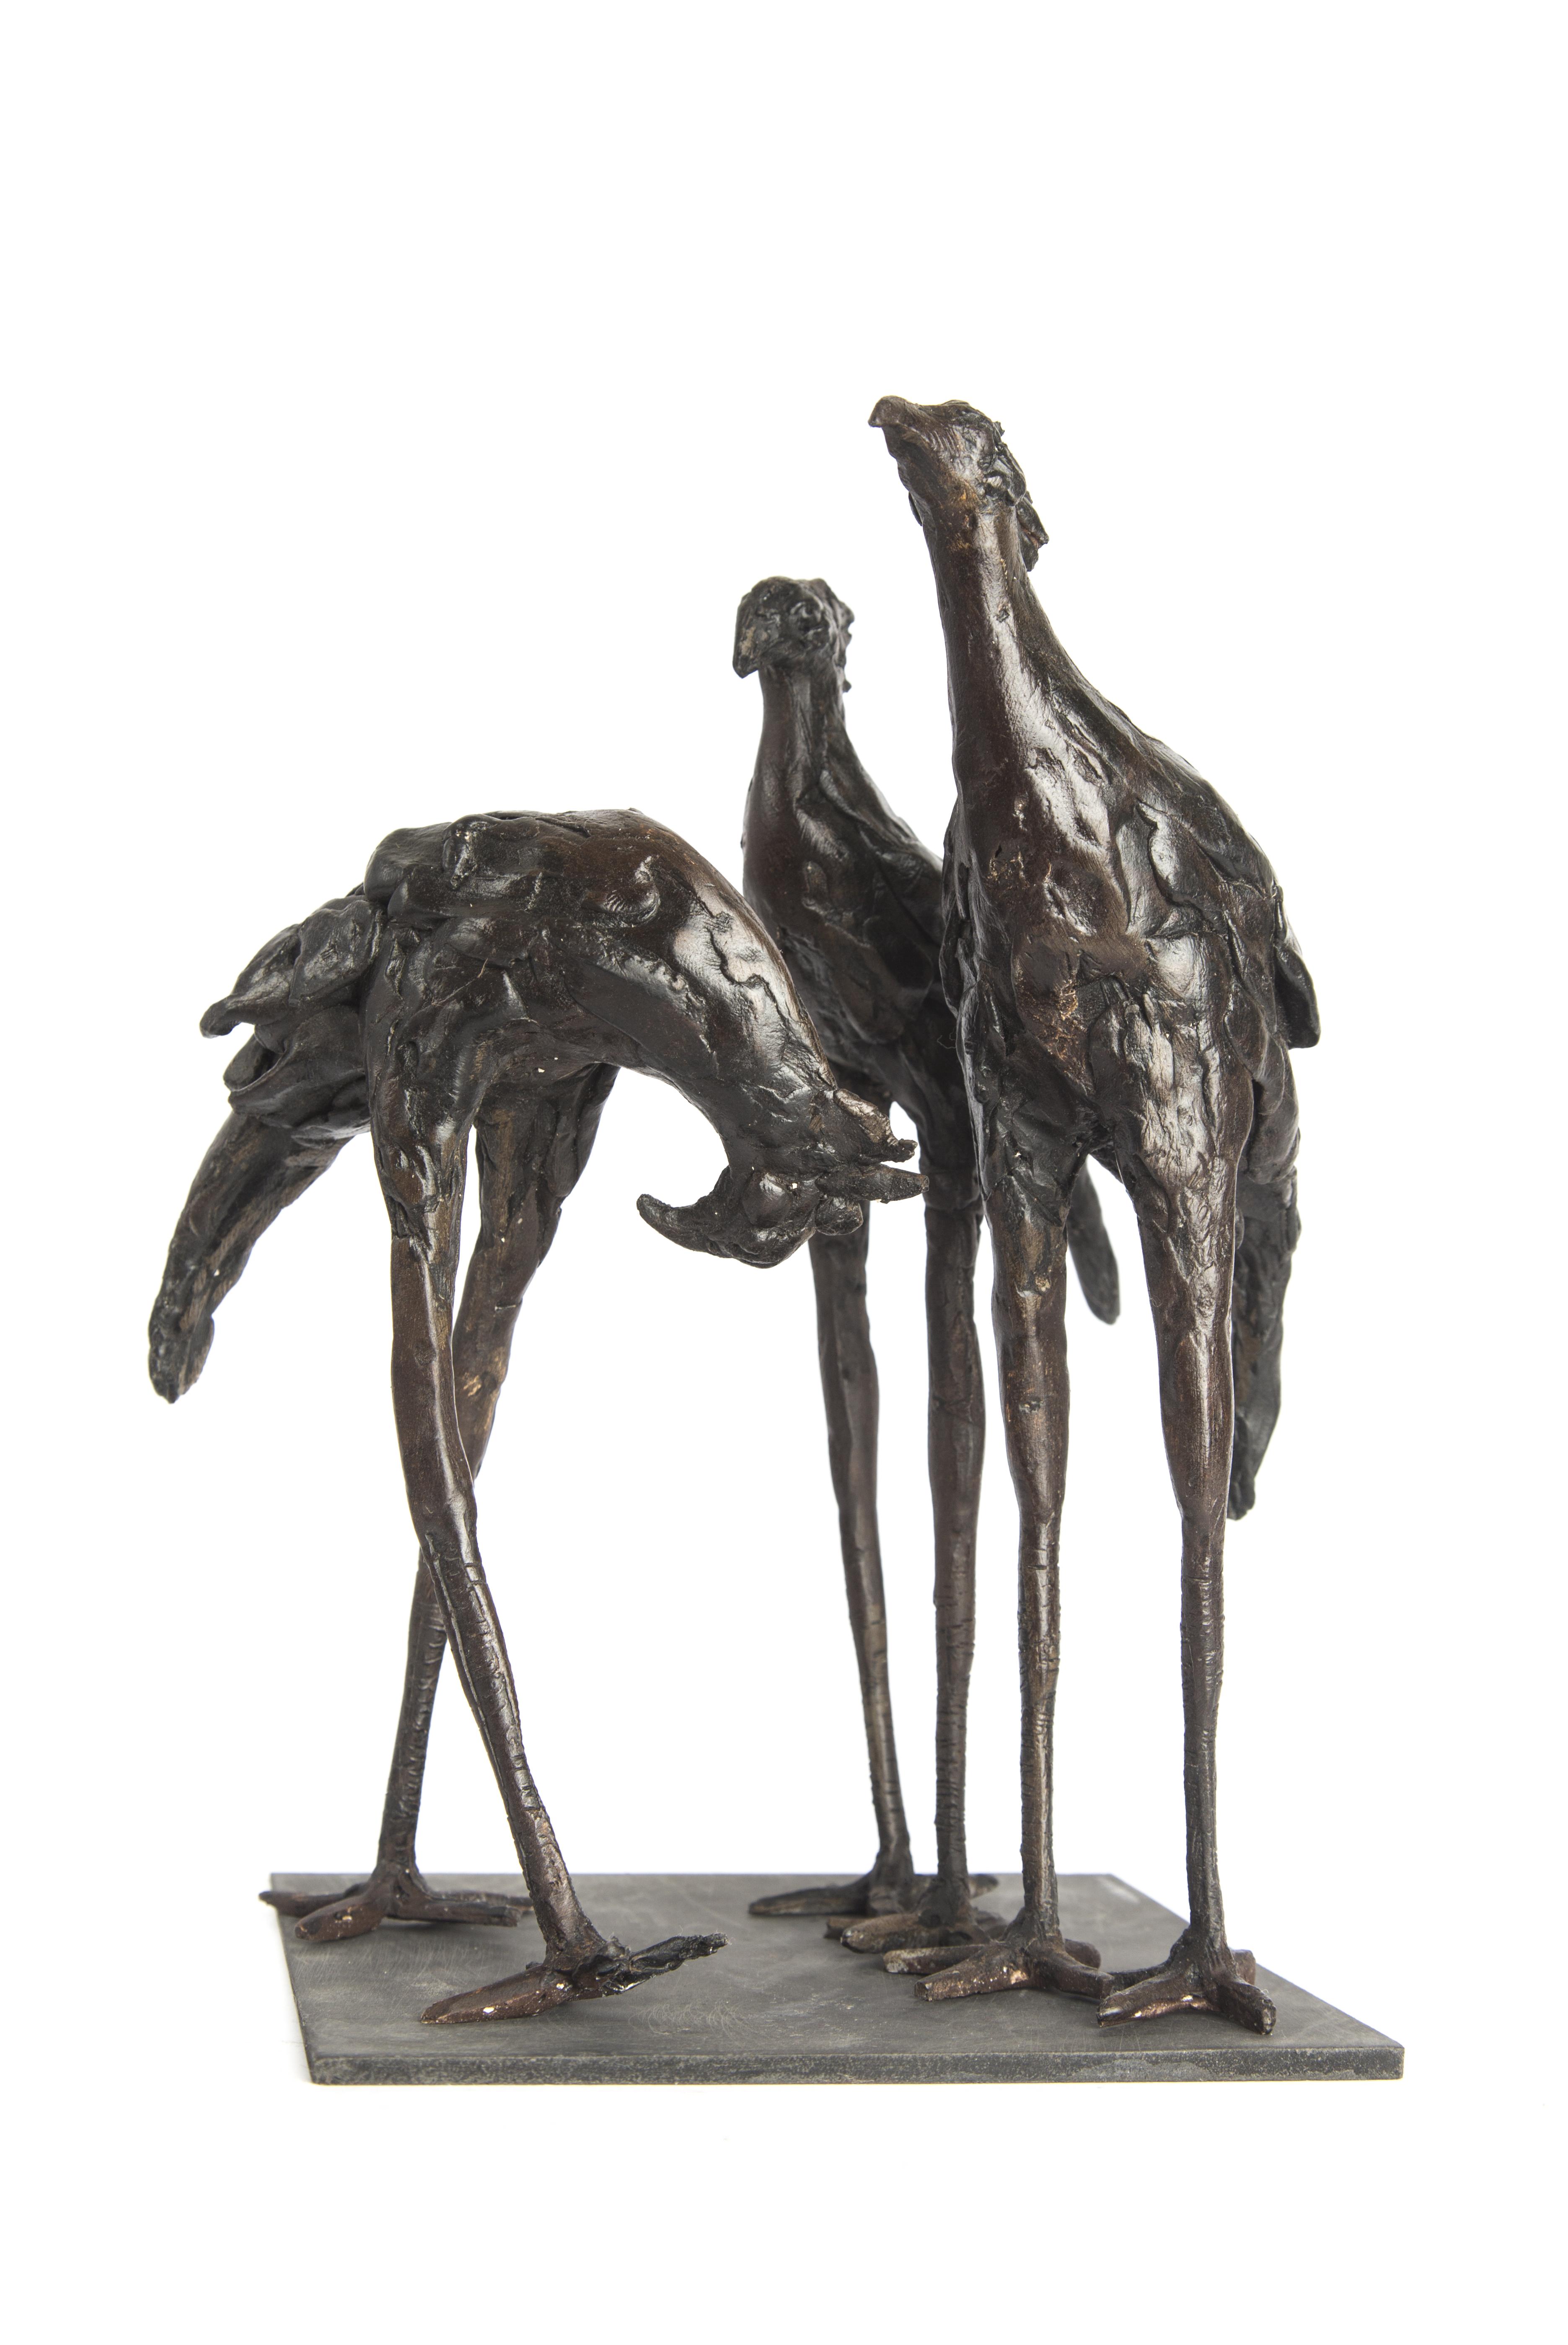 SERPENTAIRE / SECRETARY BIRD GROUP